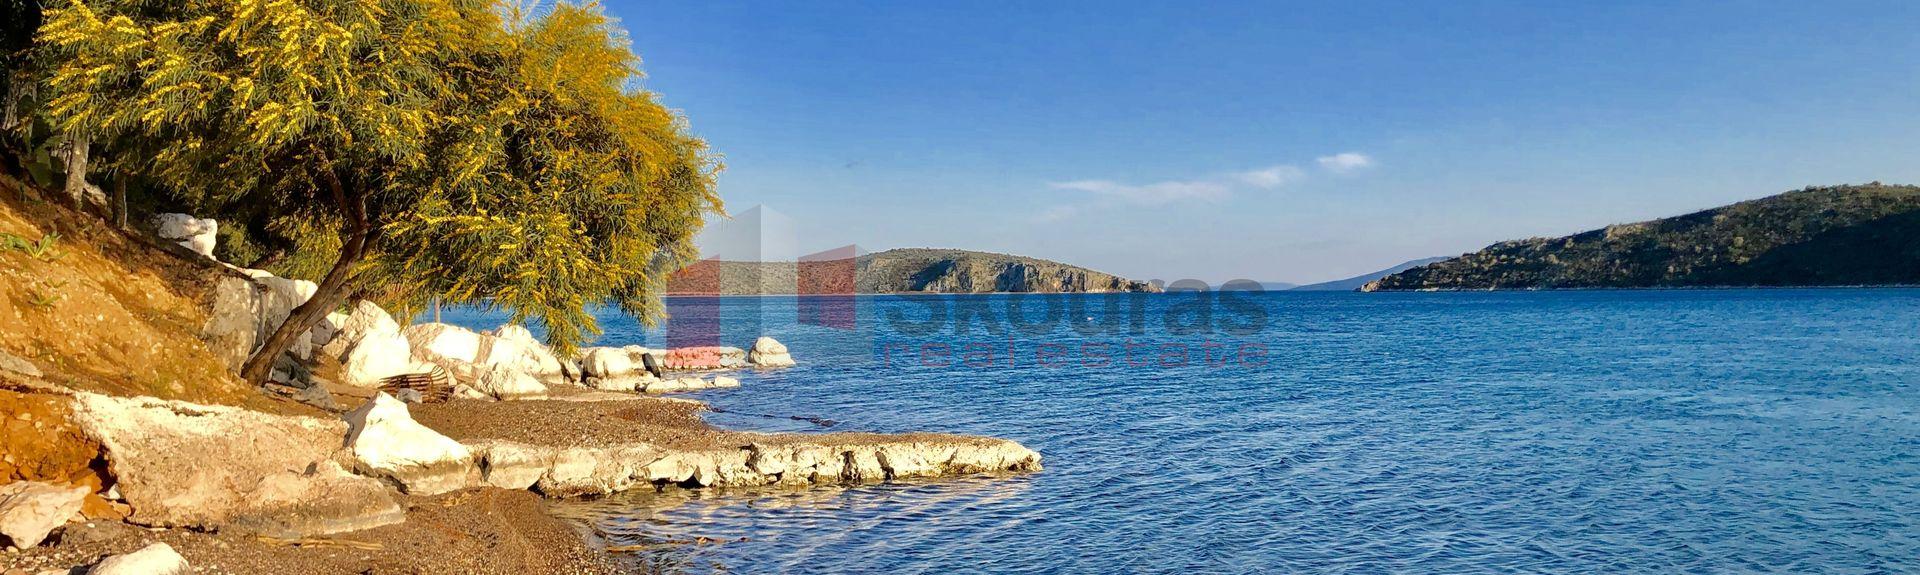 Port of Nafplio, Nafplio, Peloponnese, Greece